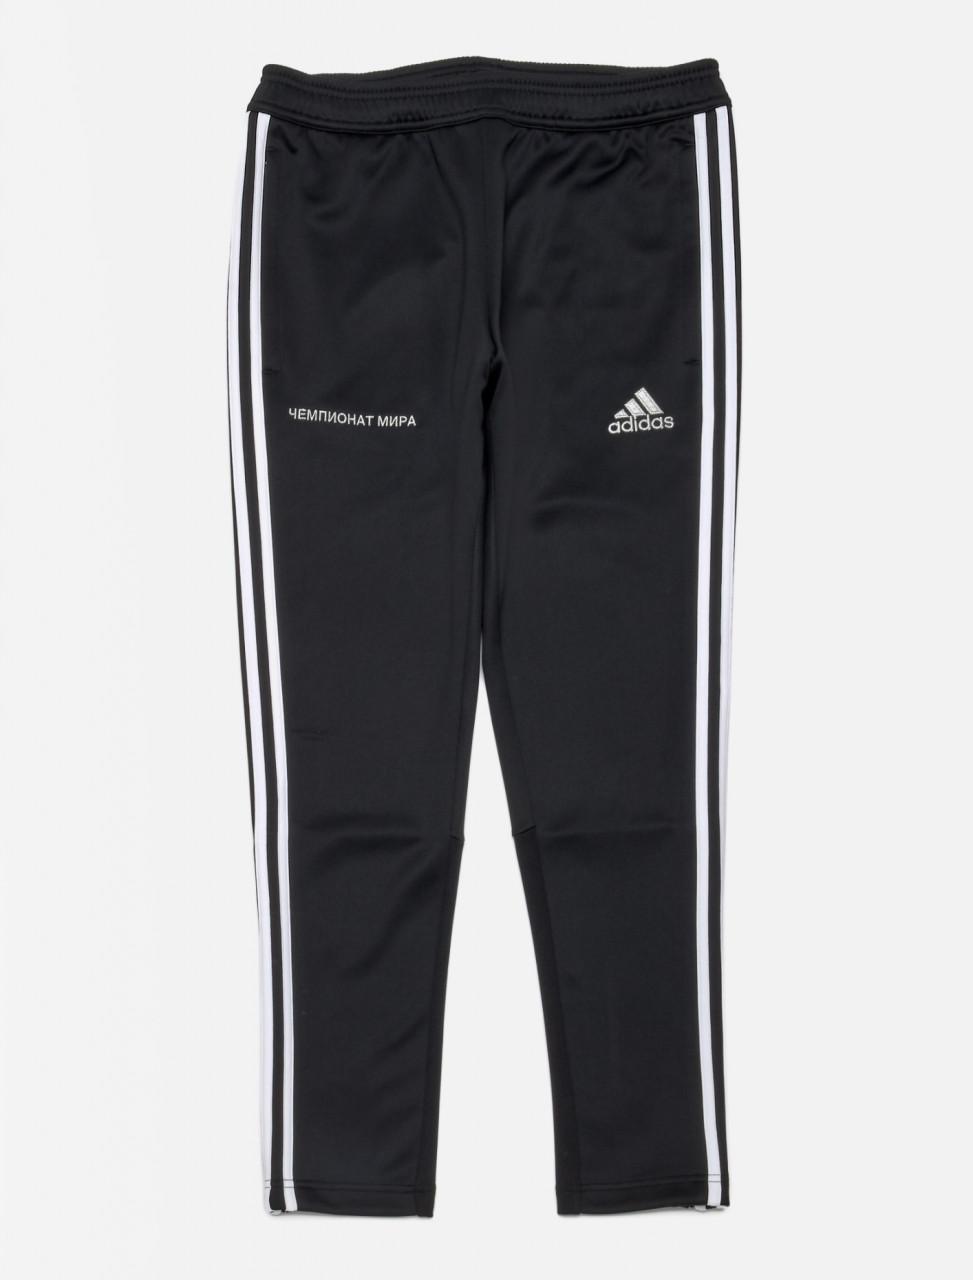 Adidas x Gosha Rubchinskiy Training Pants